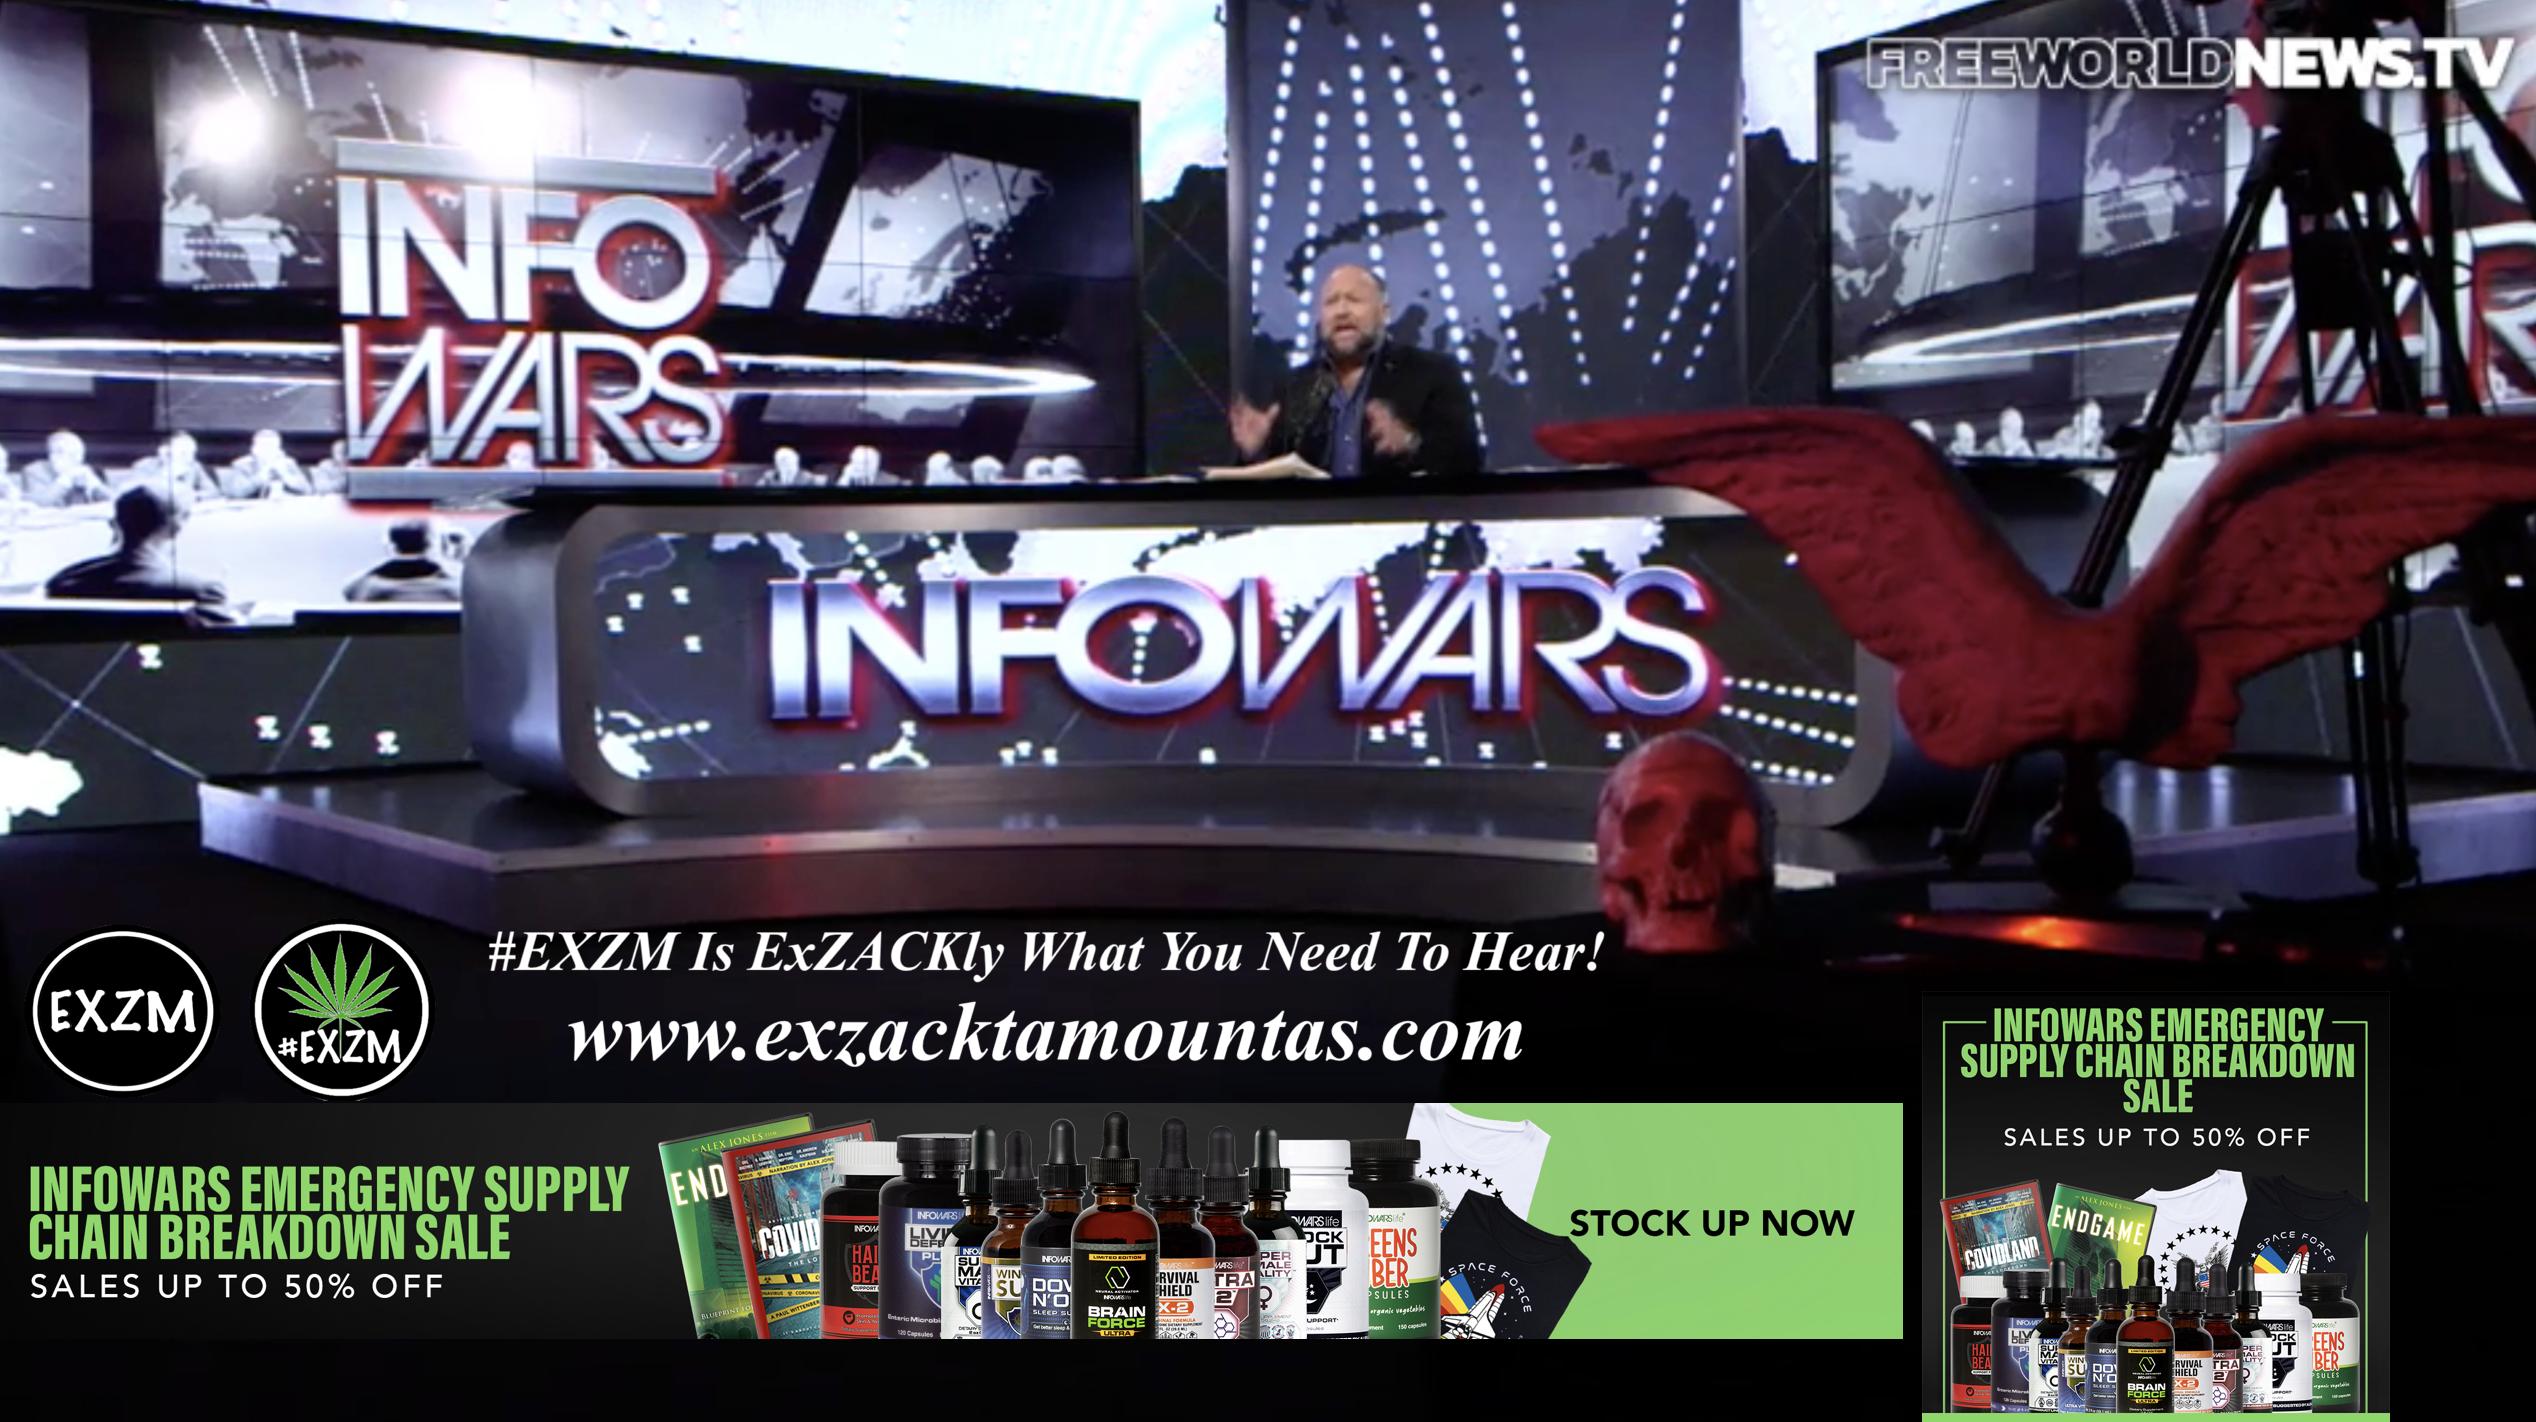 Alex Jones Live In Infowars Studio Human Skull Angel Wings Dagger Free World News TV EXZM Zack Mount October 5th 2021 copy